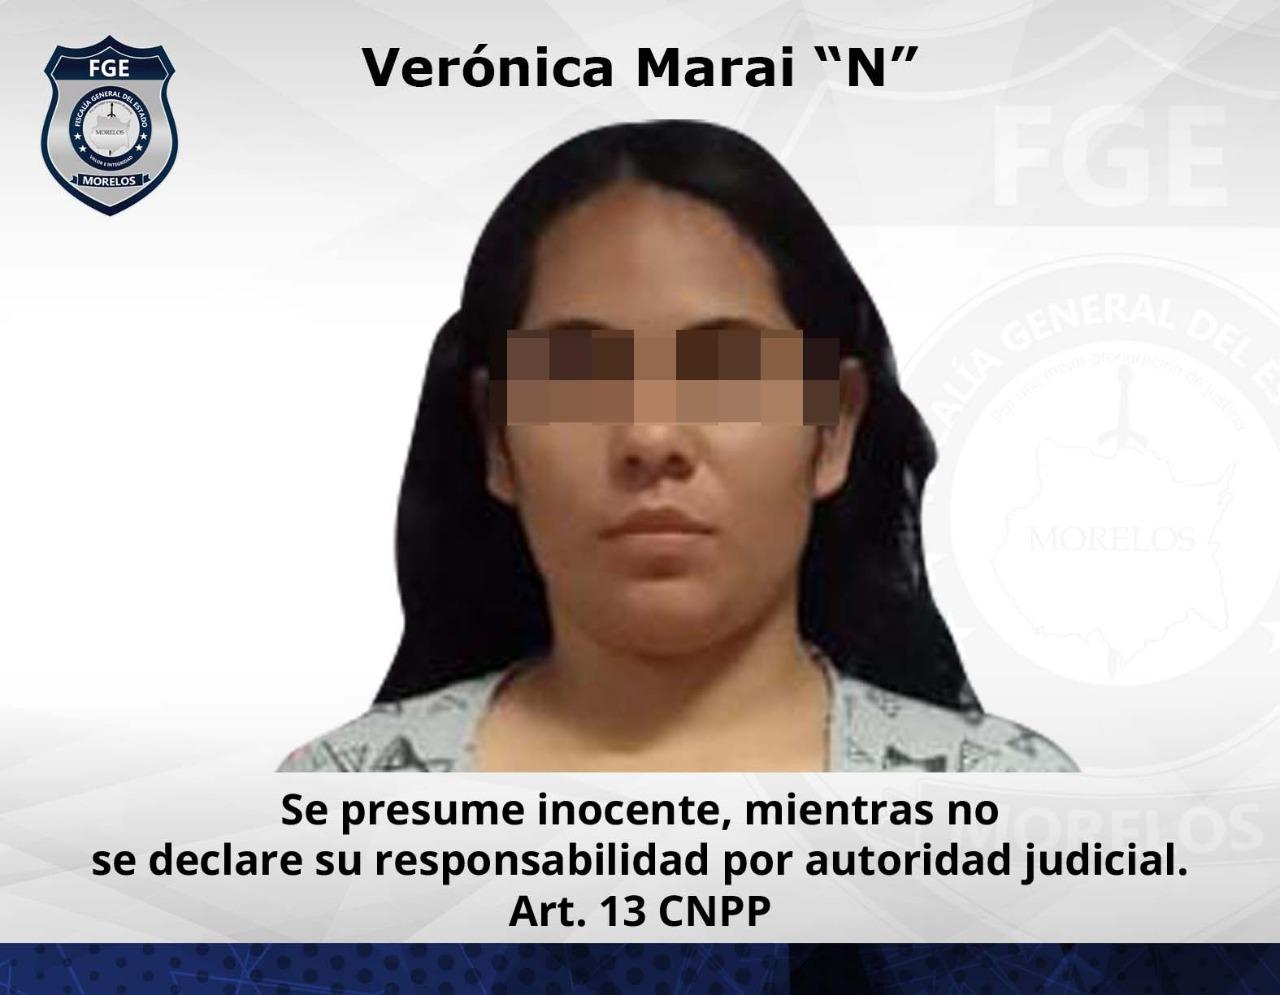 VEronica MAria